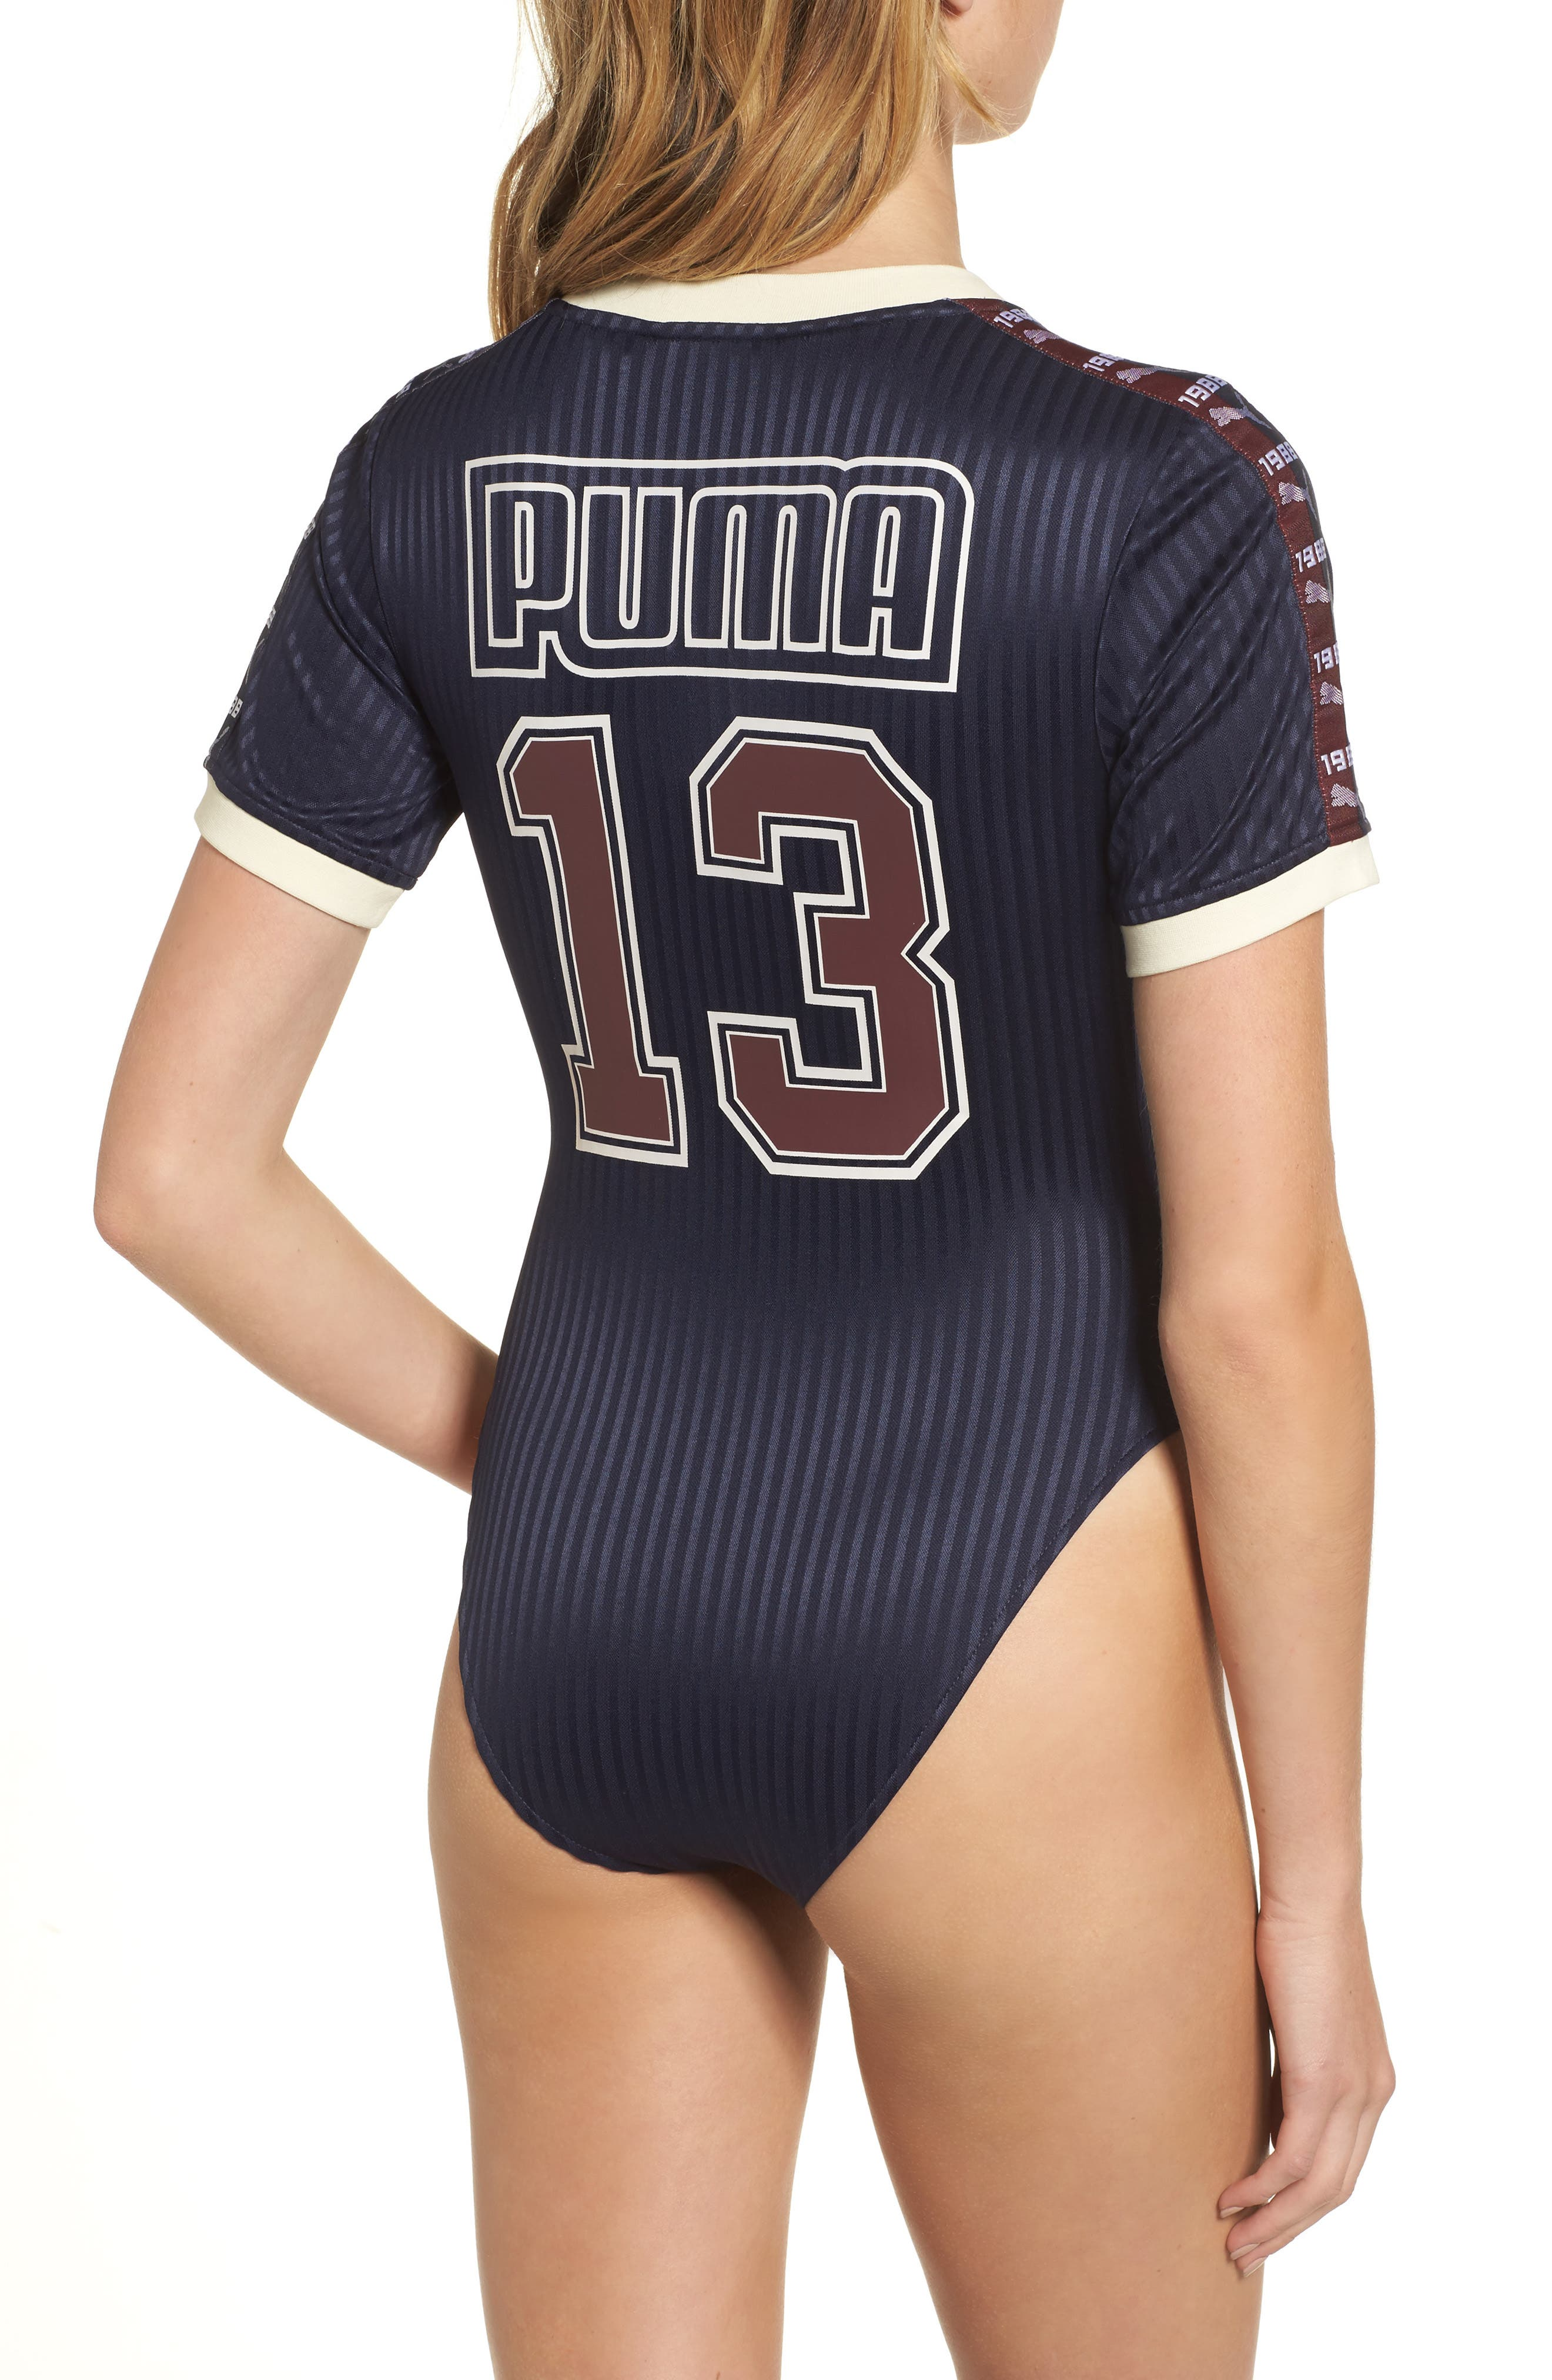 FENTY PUMA by Rihanna Bodysuit,                             Alternate thumbnail 3, color,                             400